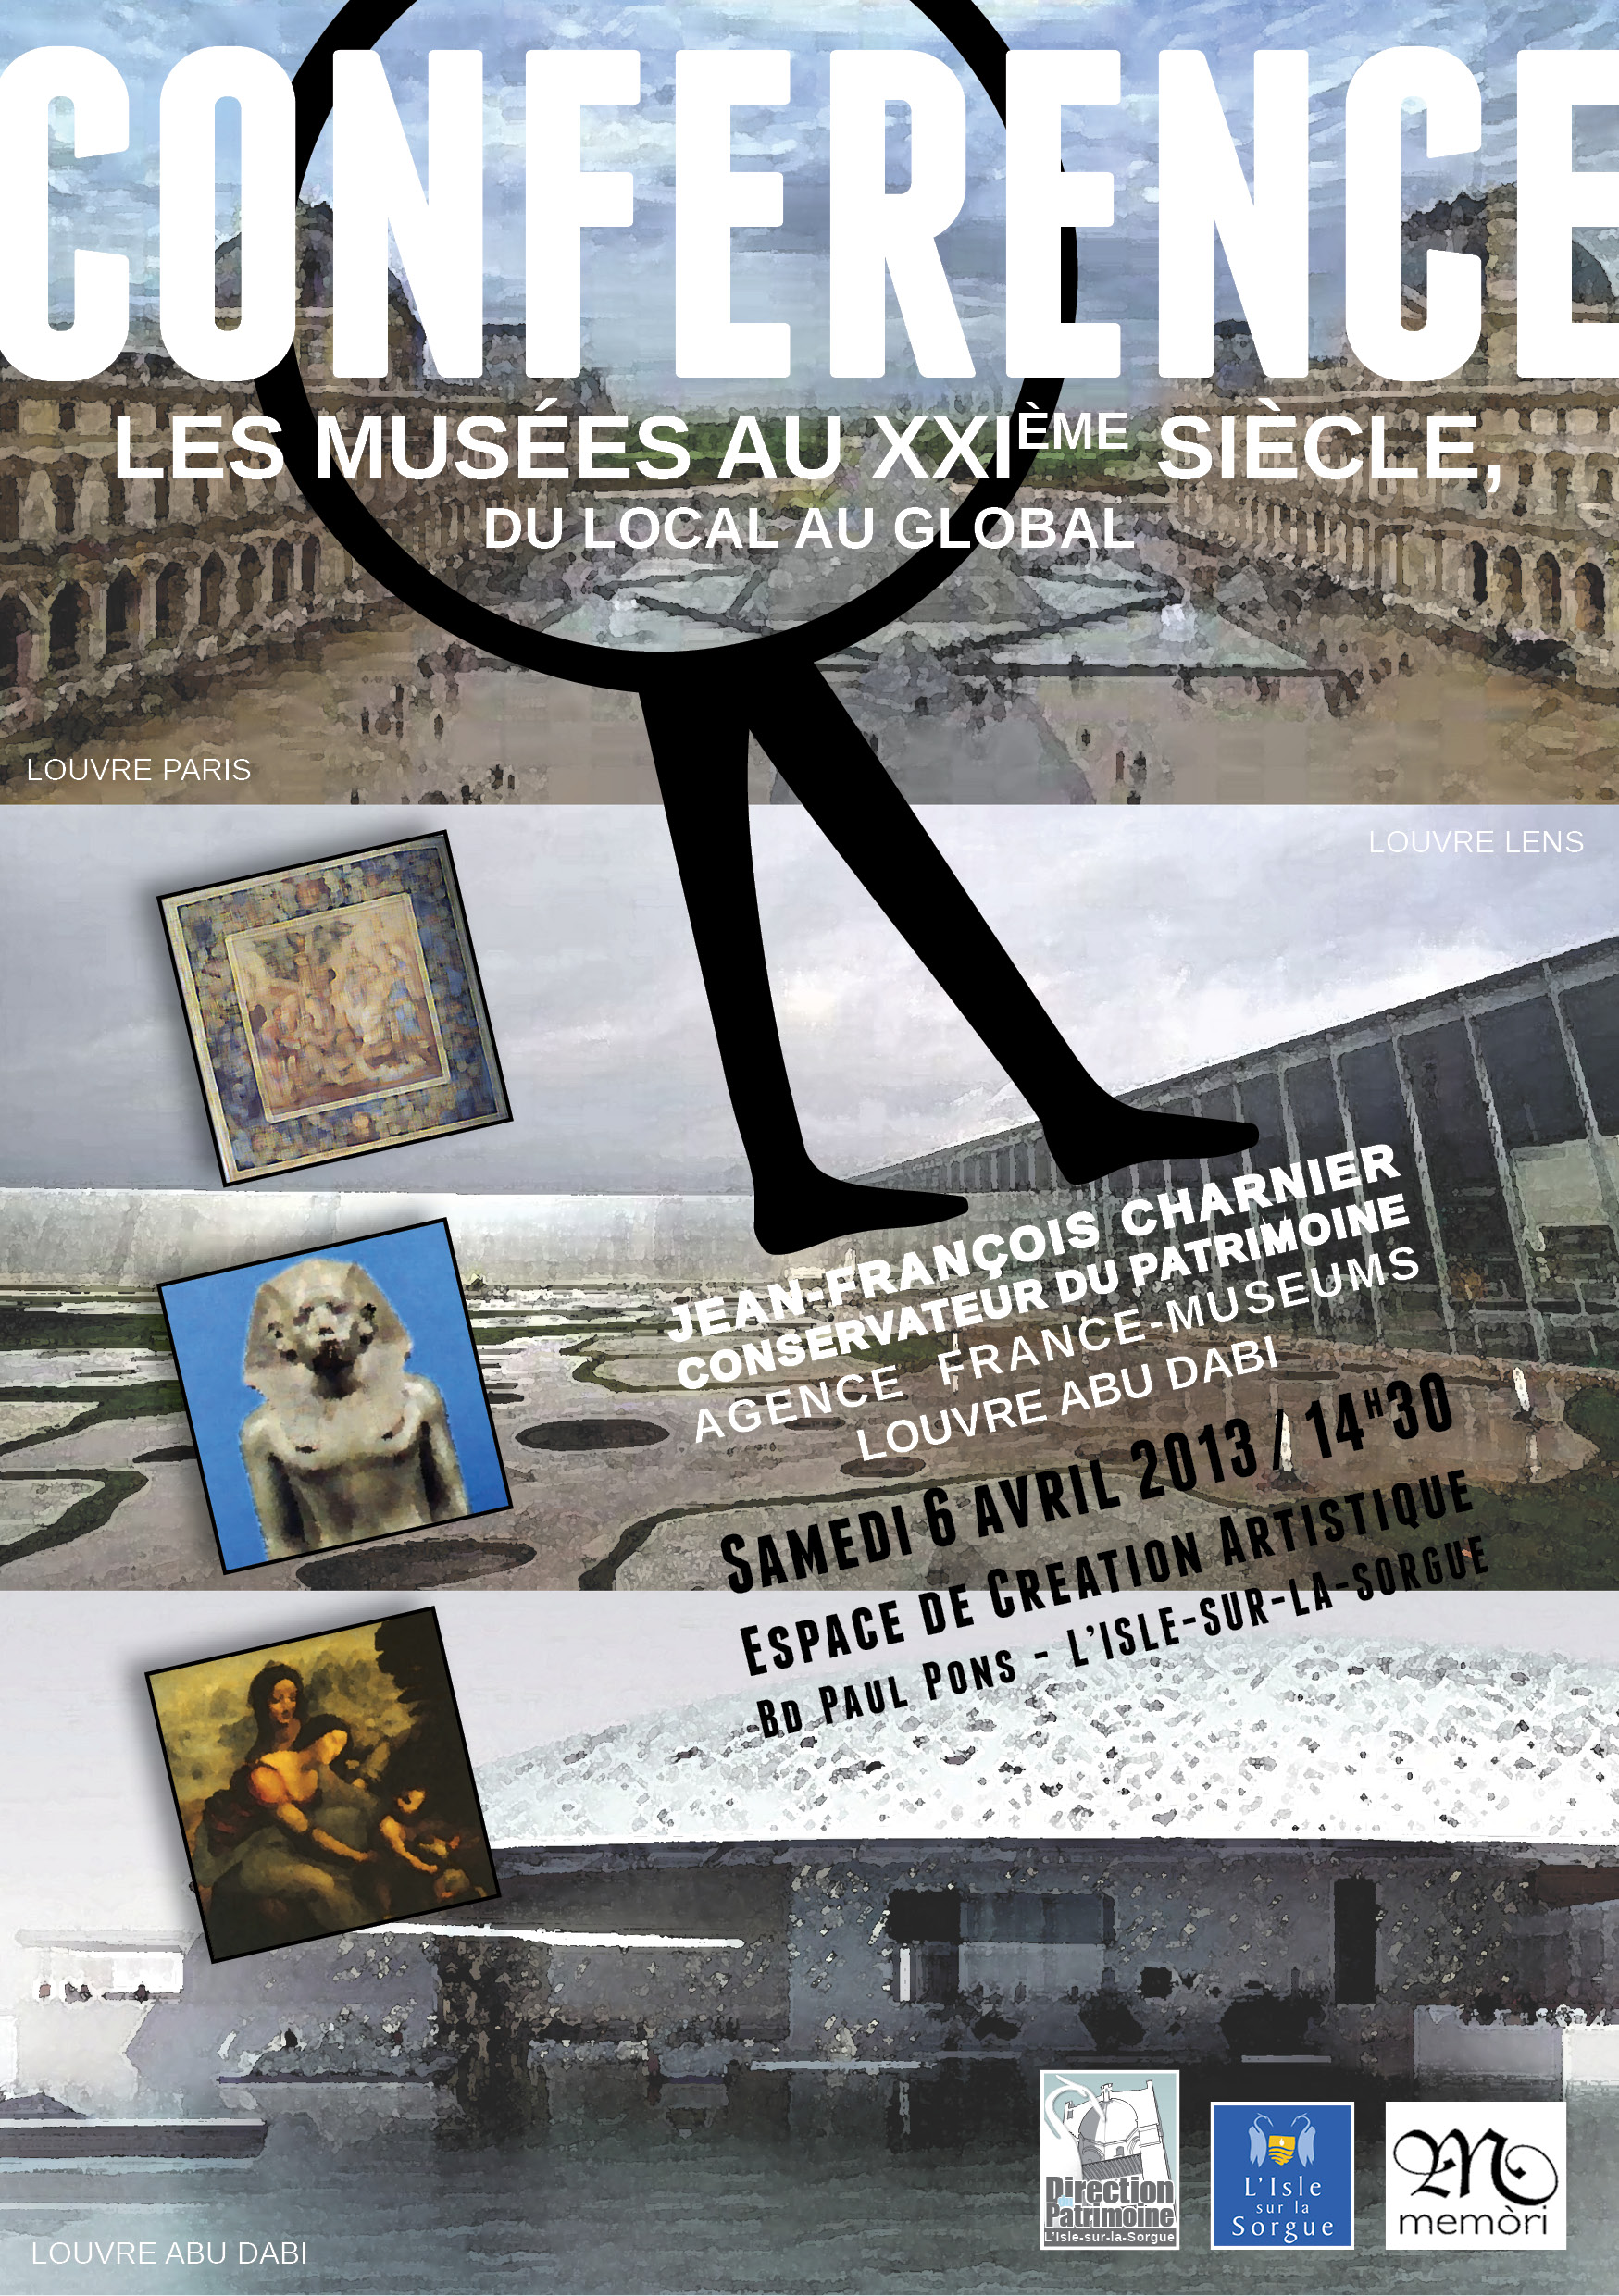 flyer MUSEES AU XXIe SIECLE (2)